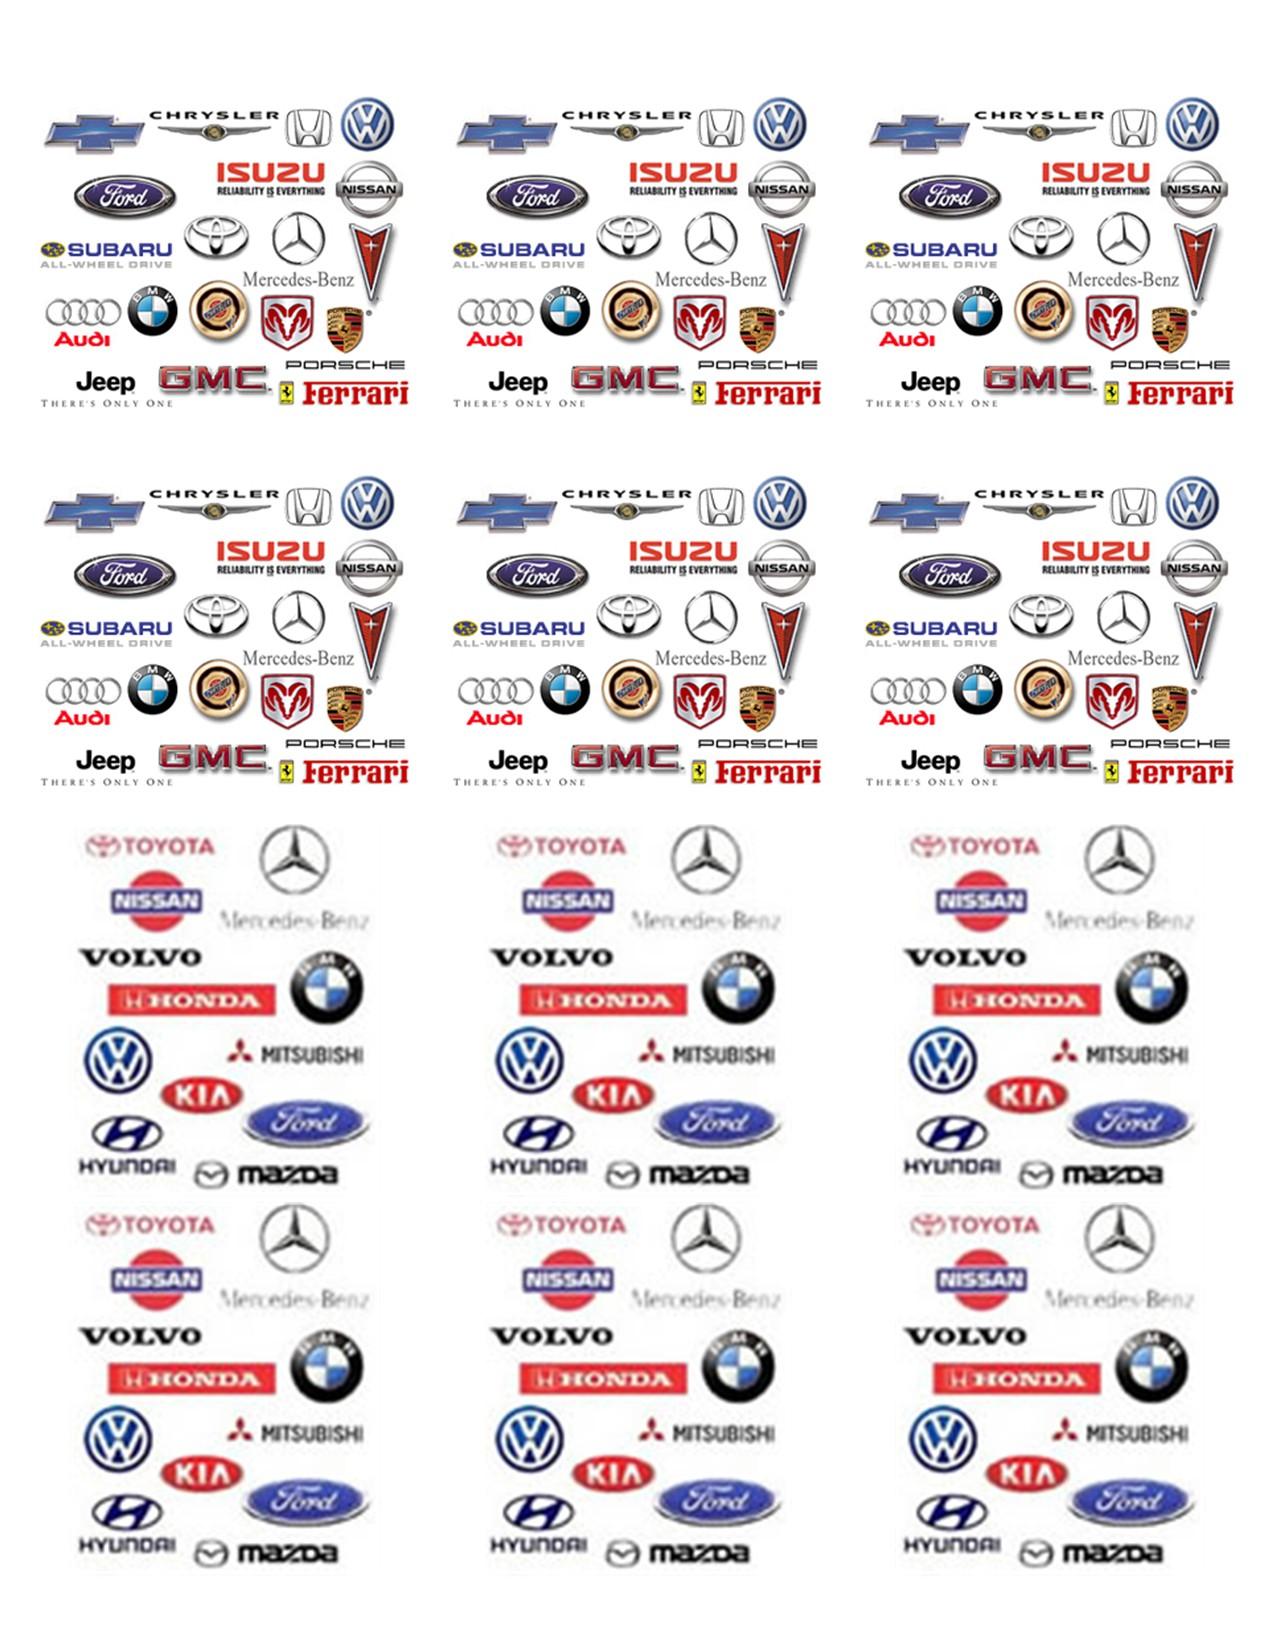 Car Manufacturer Logos And Names New Cars Upcoming 2019 2020